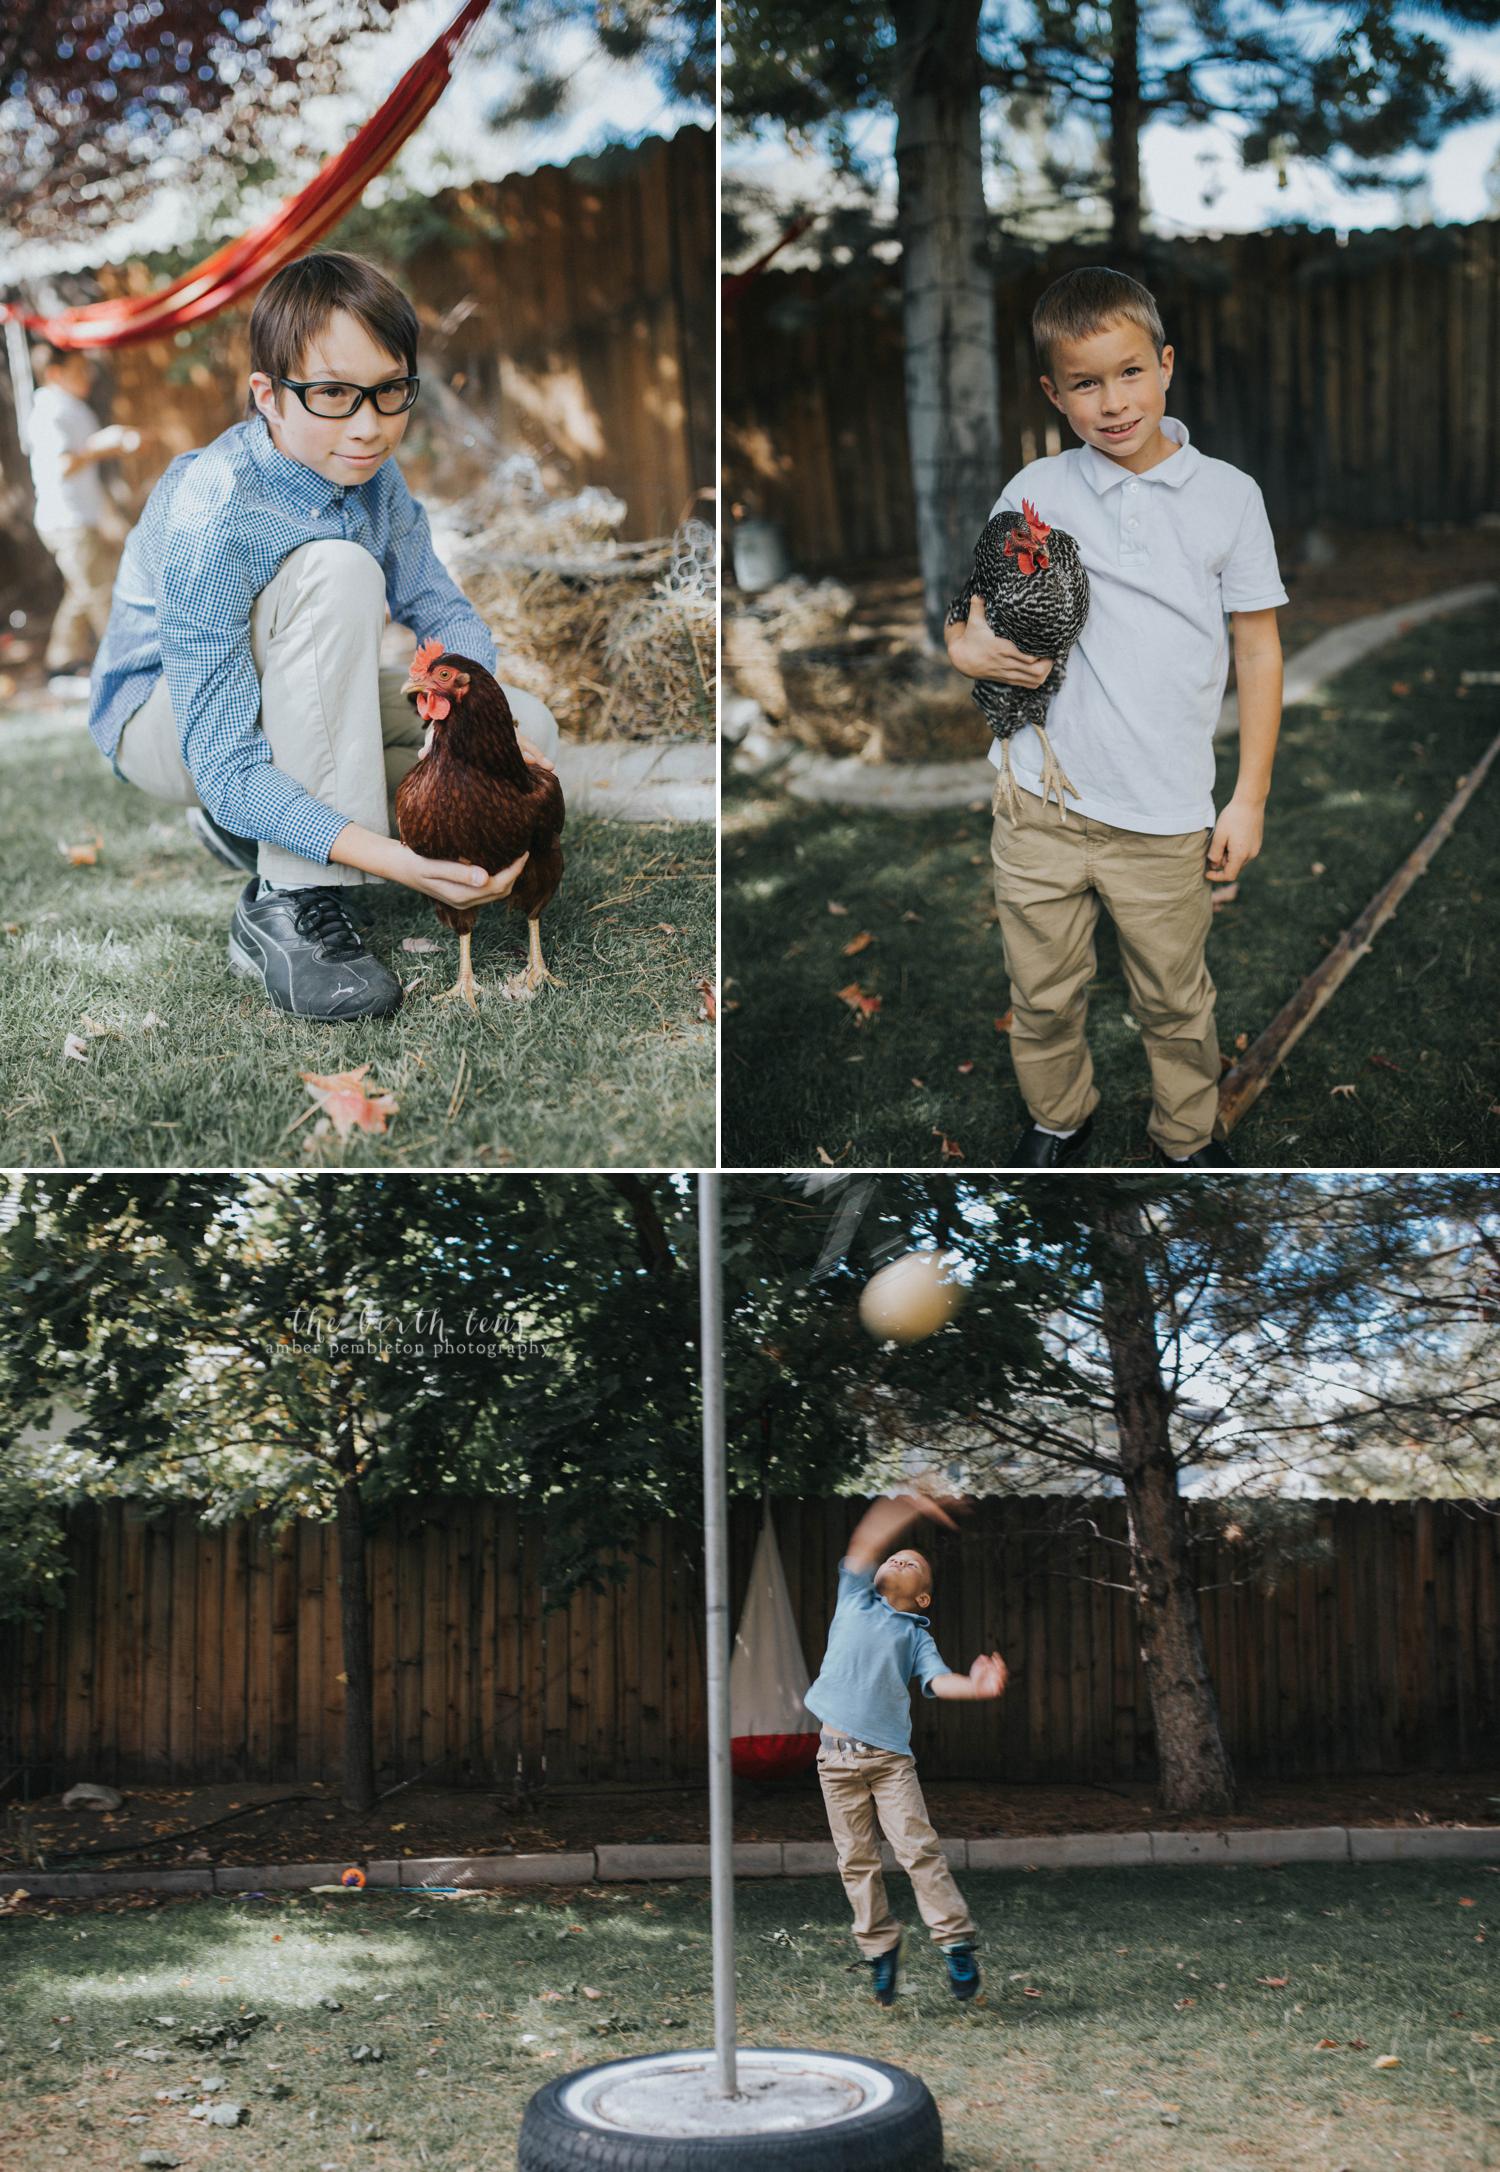 boys-playing-at-home-reno-tahoe.jpg